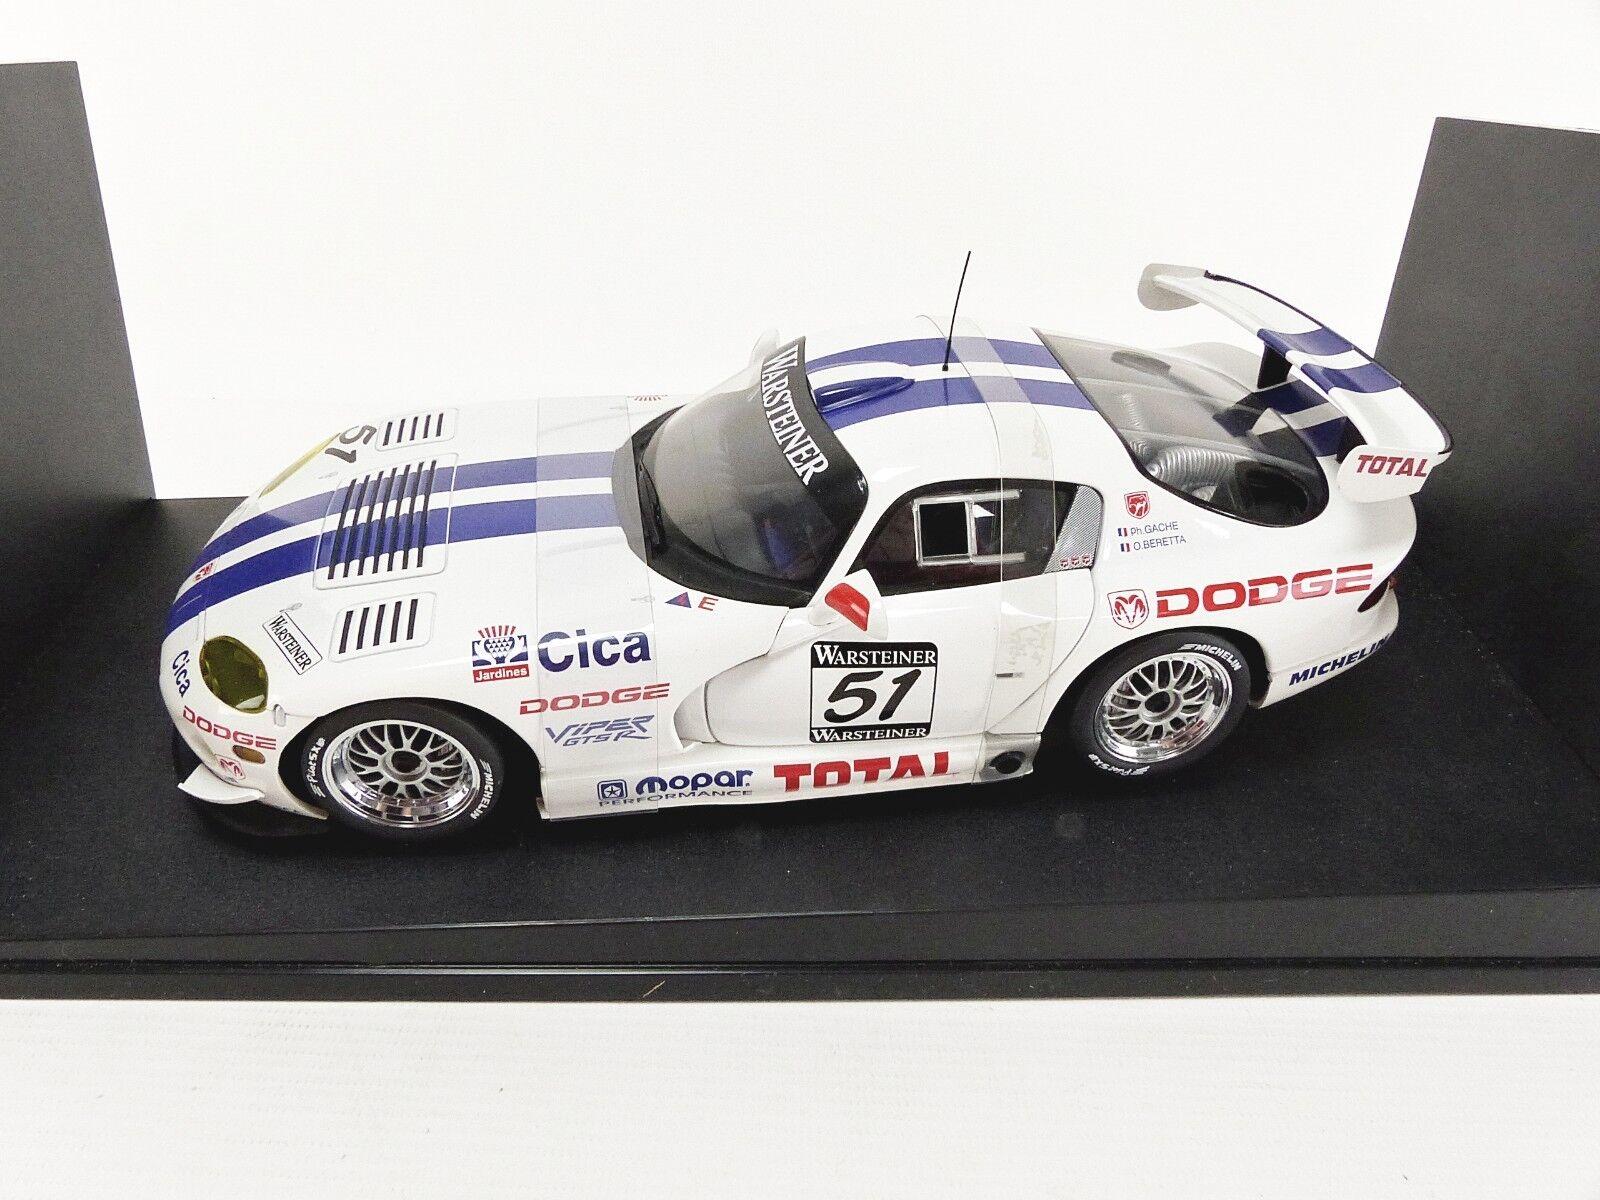 AUTOART 1 18 - DODGE VIPER GTS-R SEBRING 1997  51 - 89721